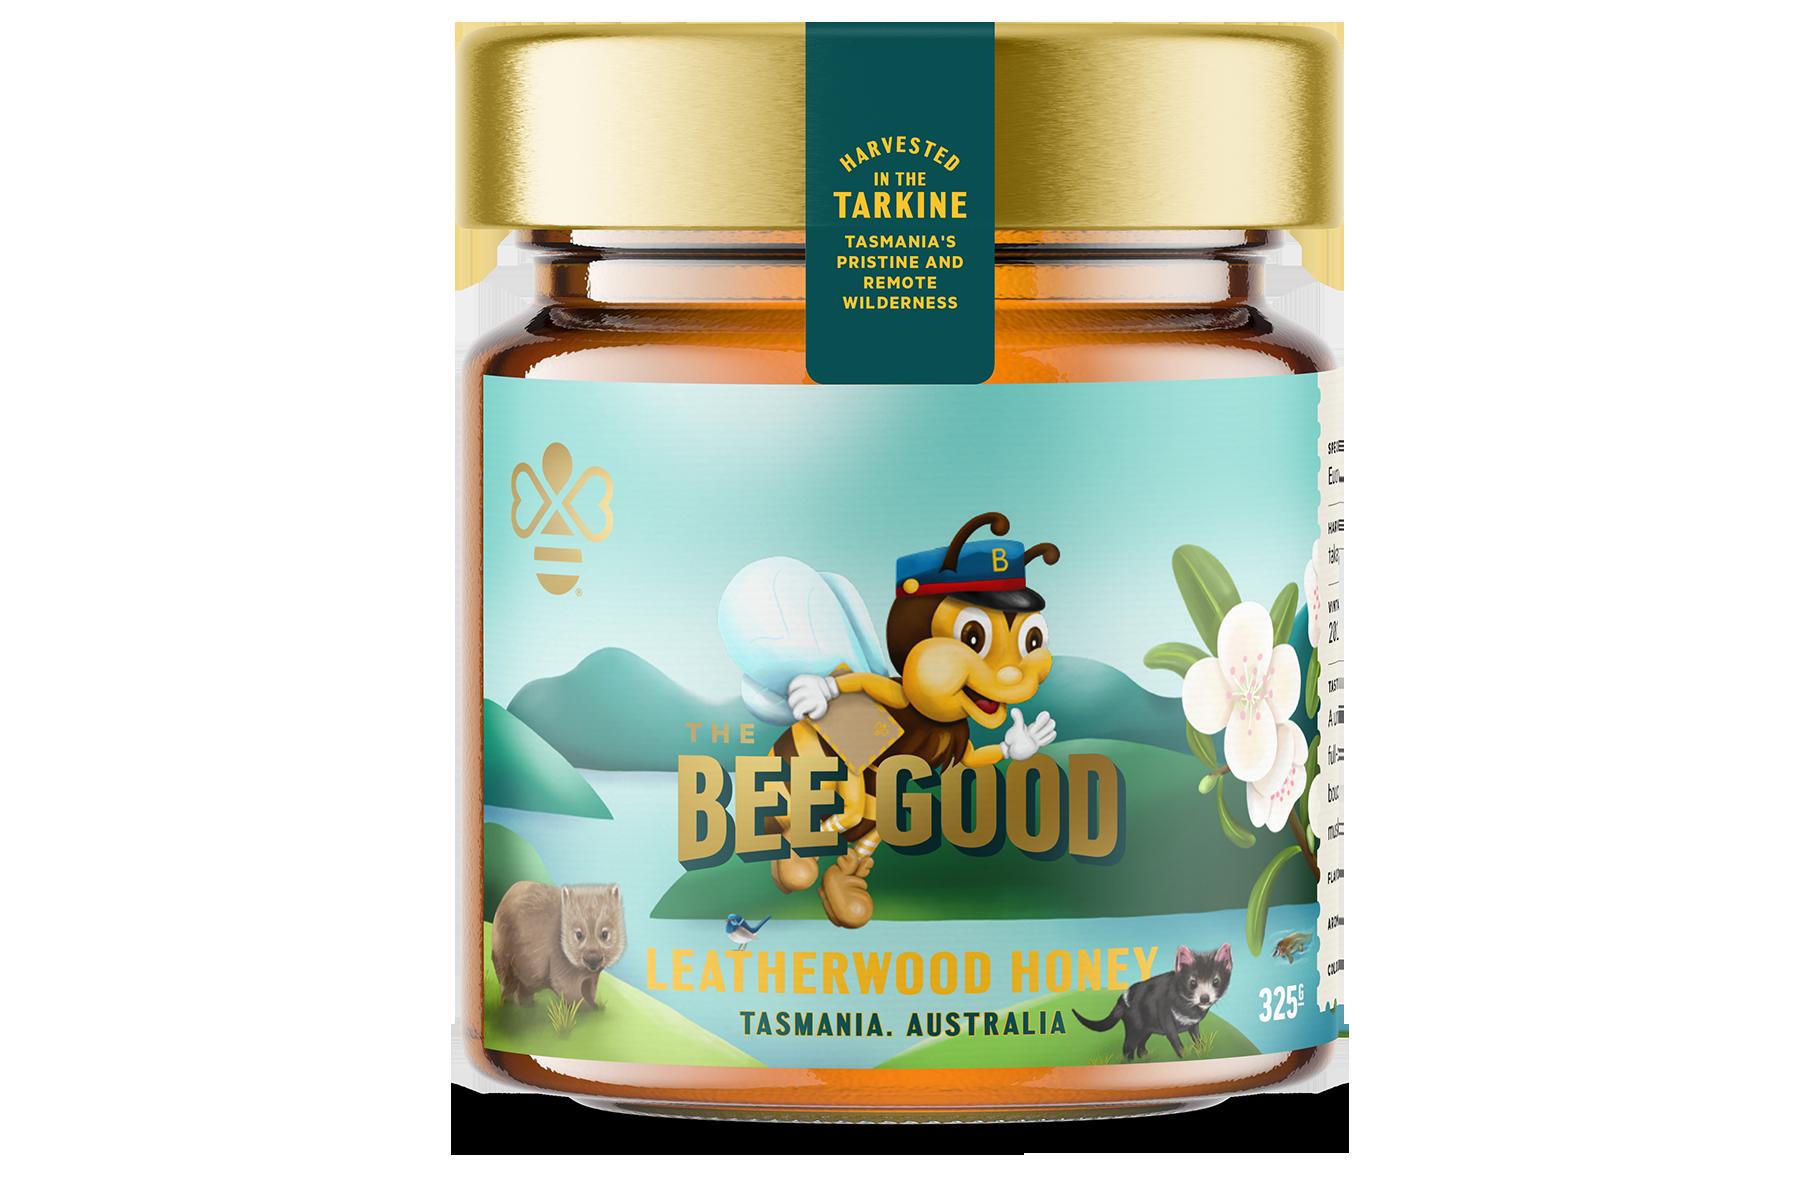 leatherwood-jar.png